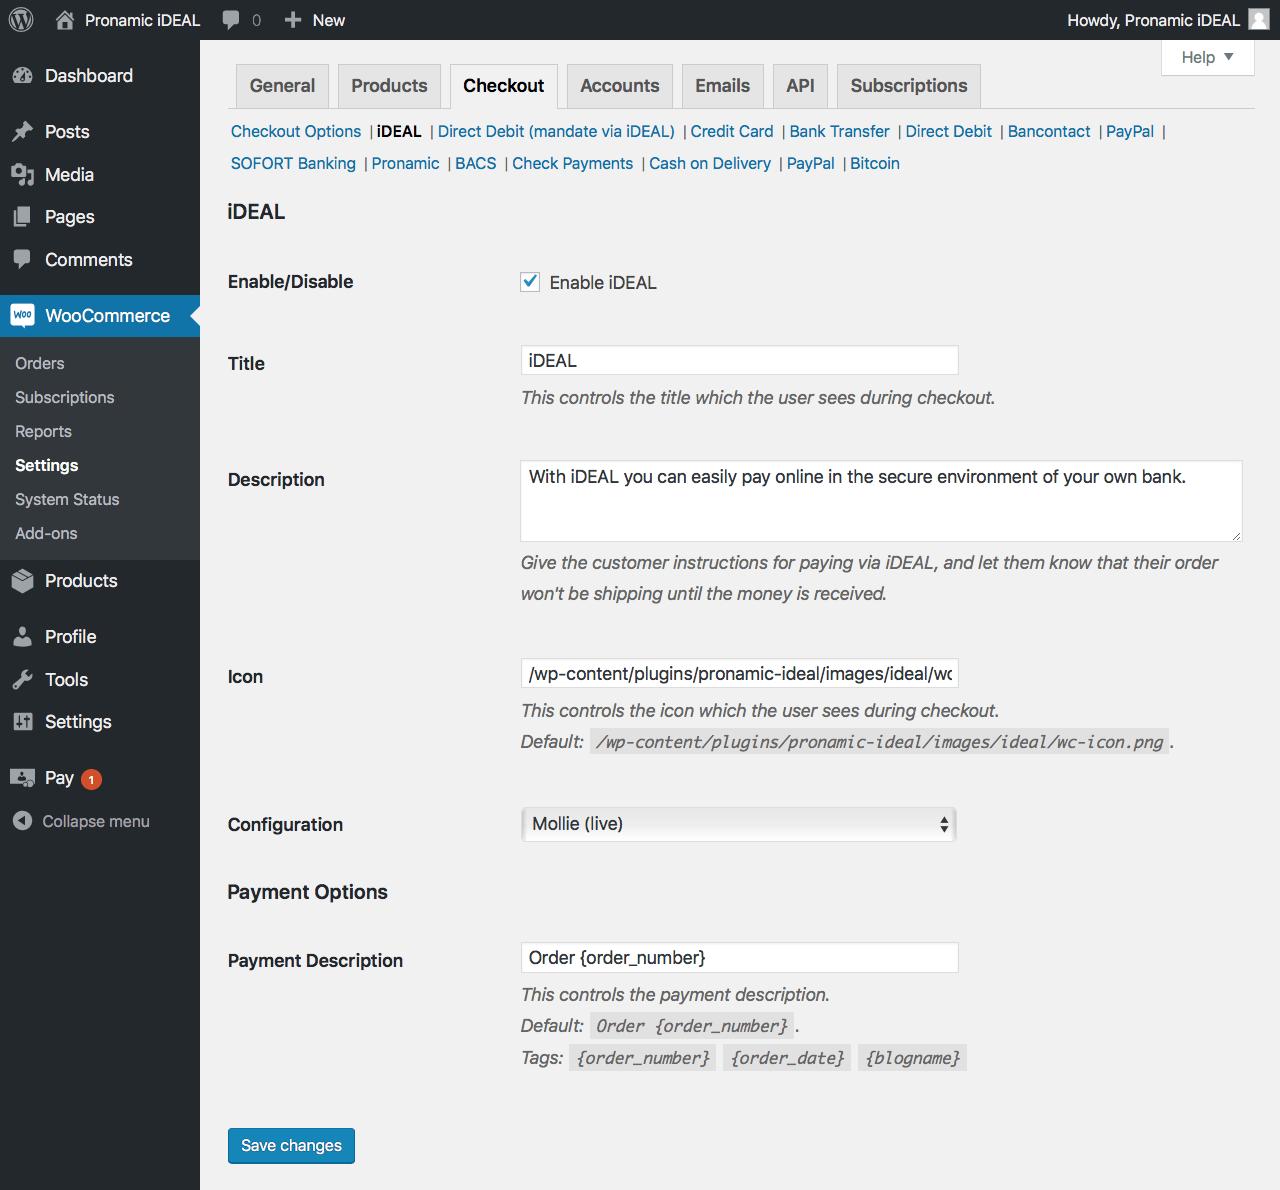 WooCommerce - Checkout settings